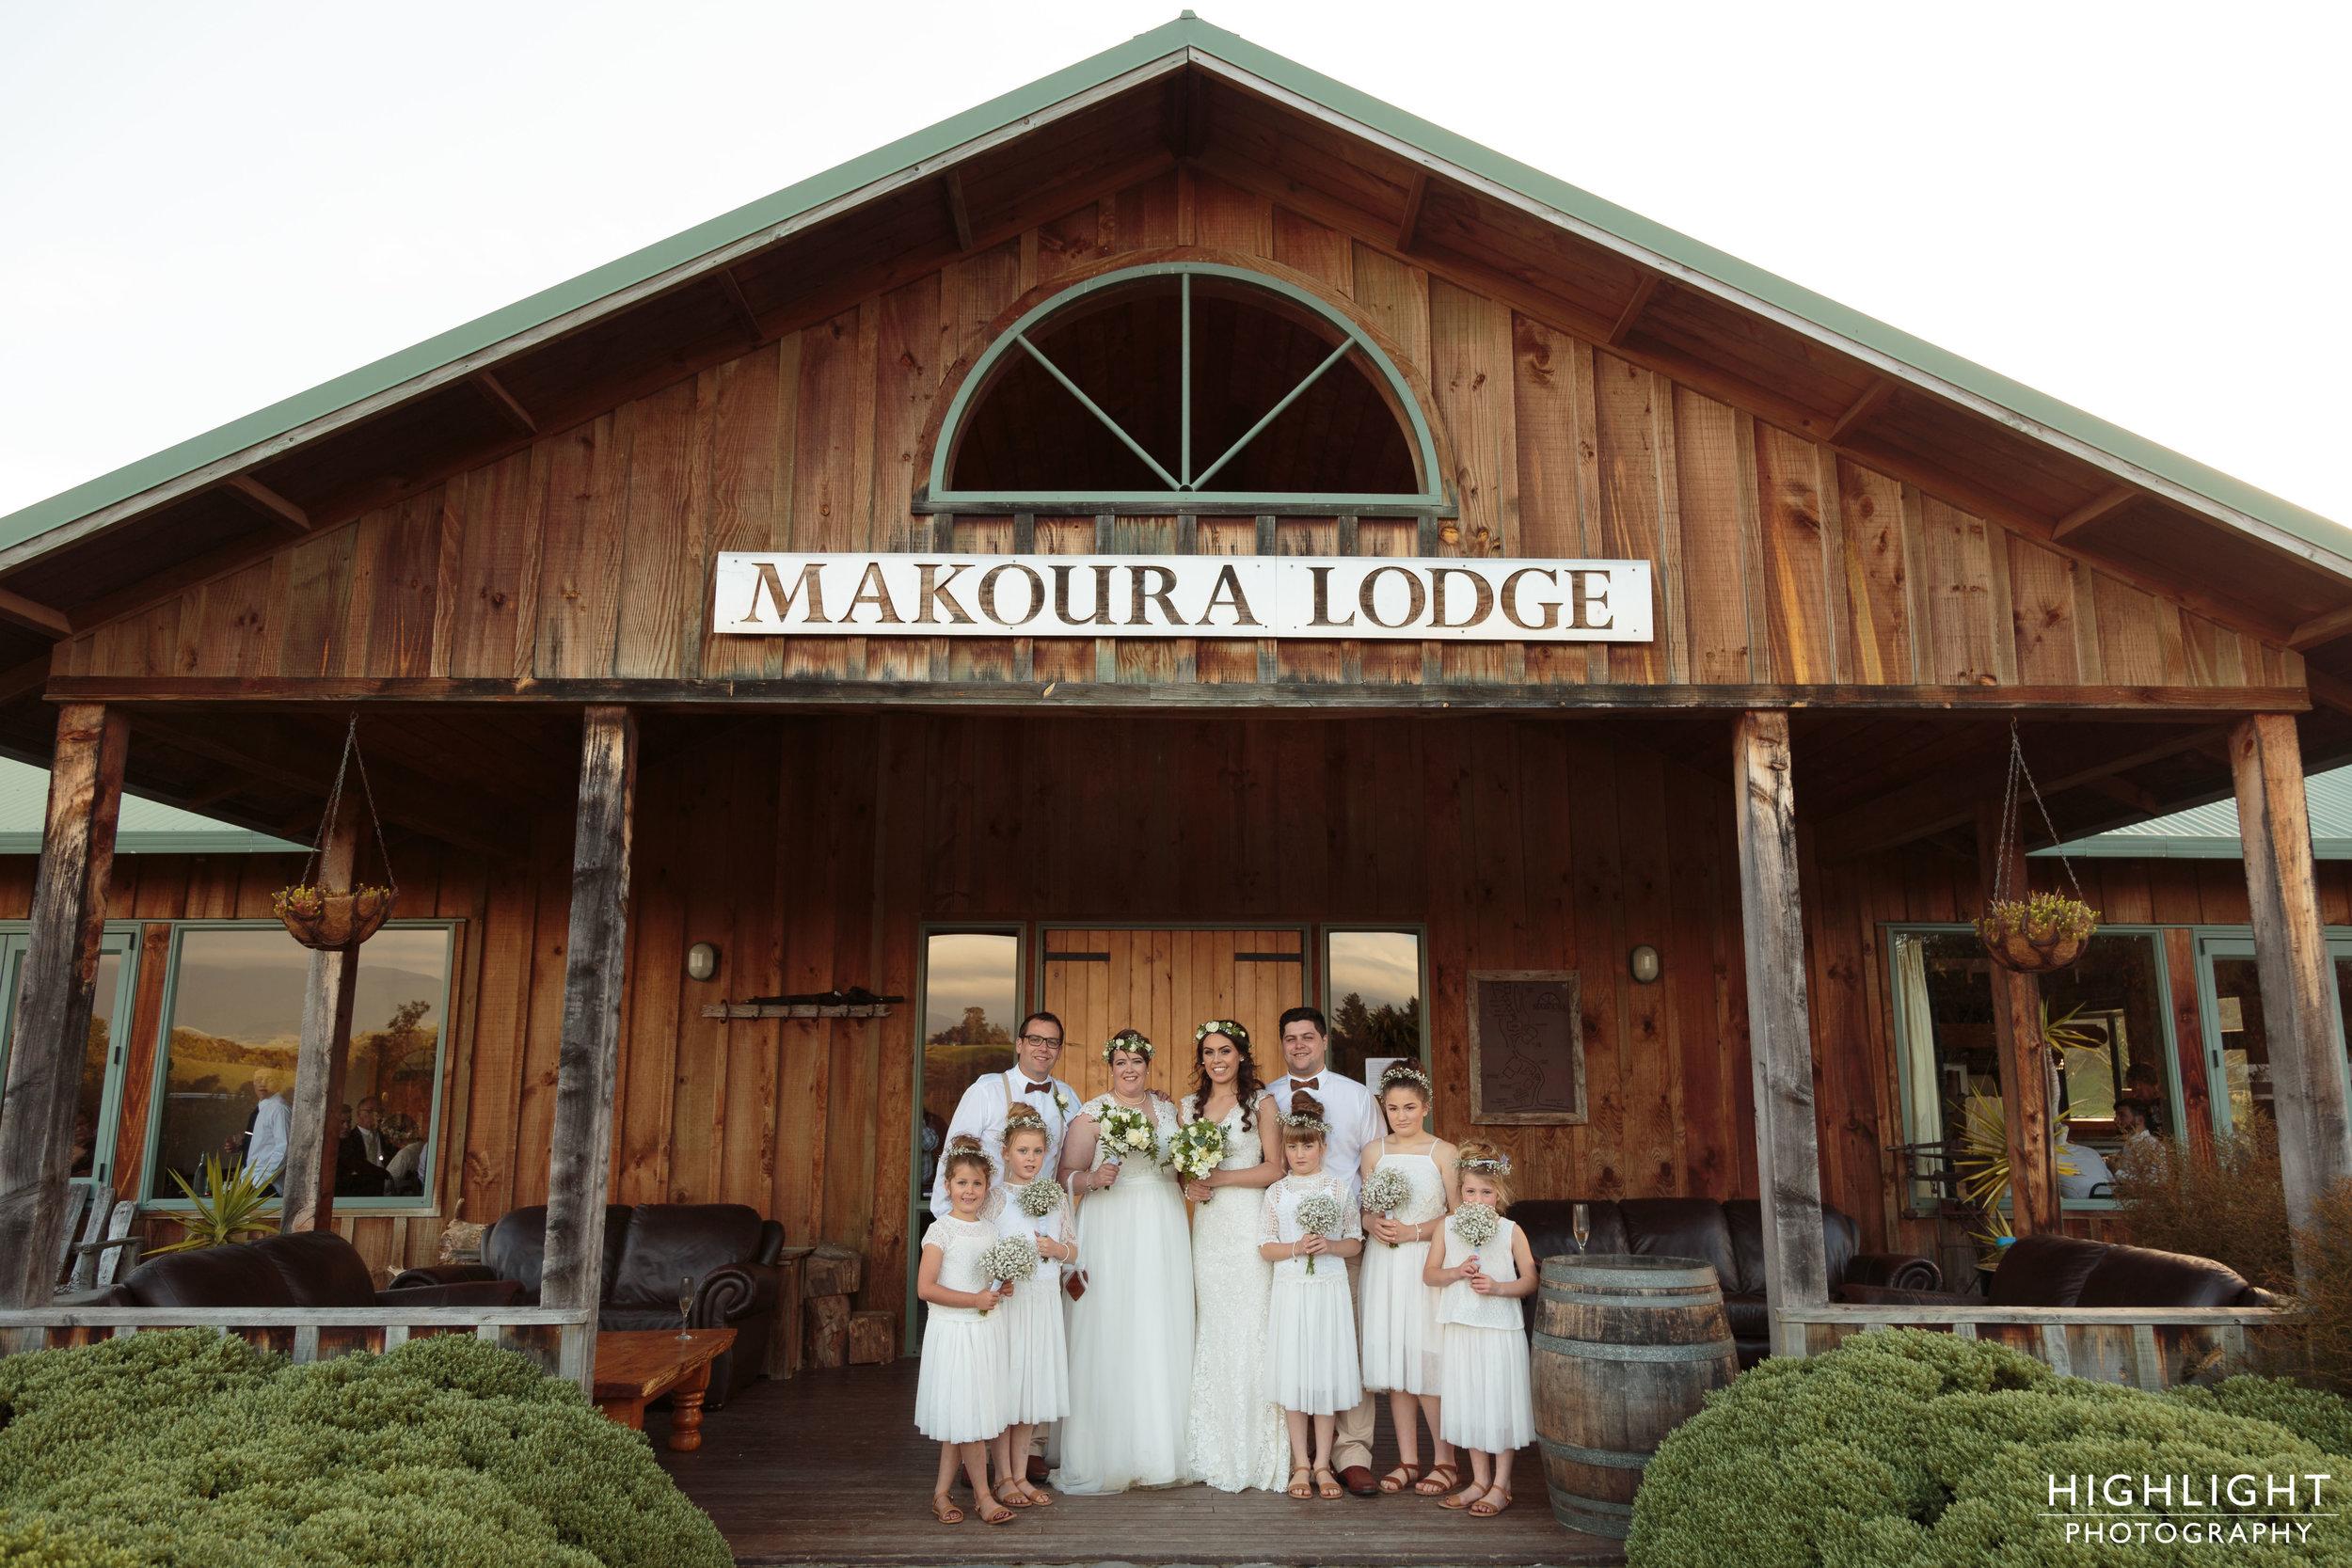 highlight_wedding_photography_makoura_lodge_manawatu_new_zealand-133.jpg